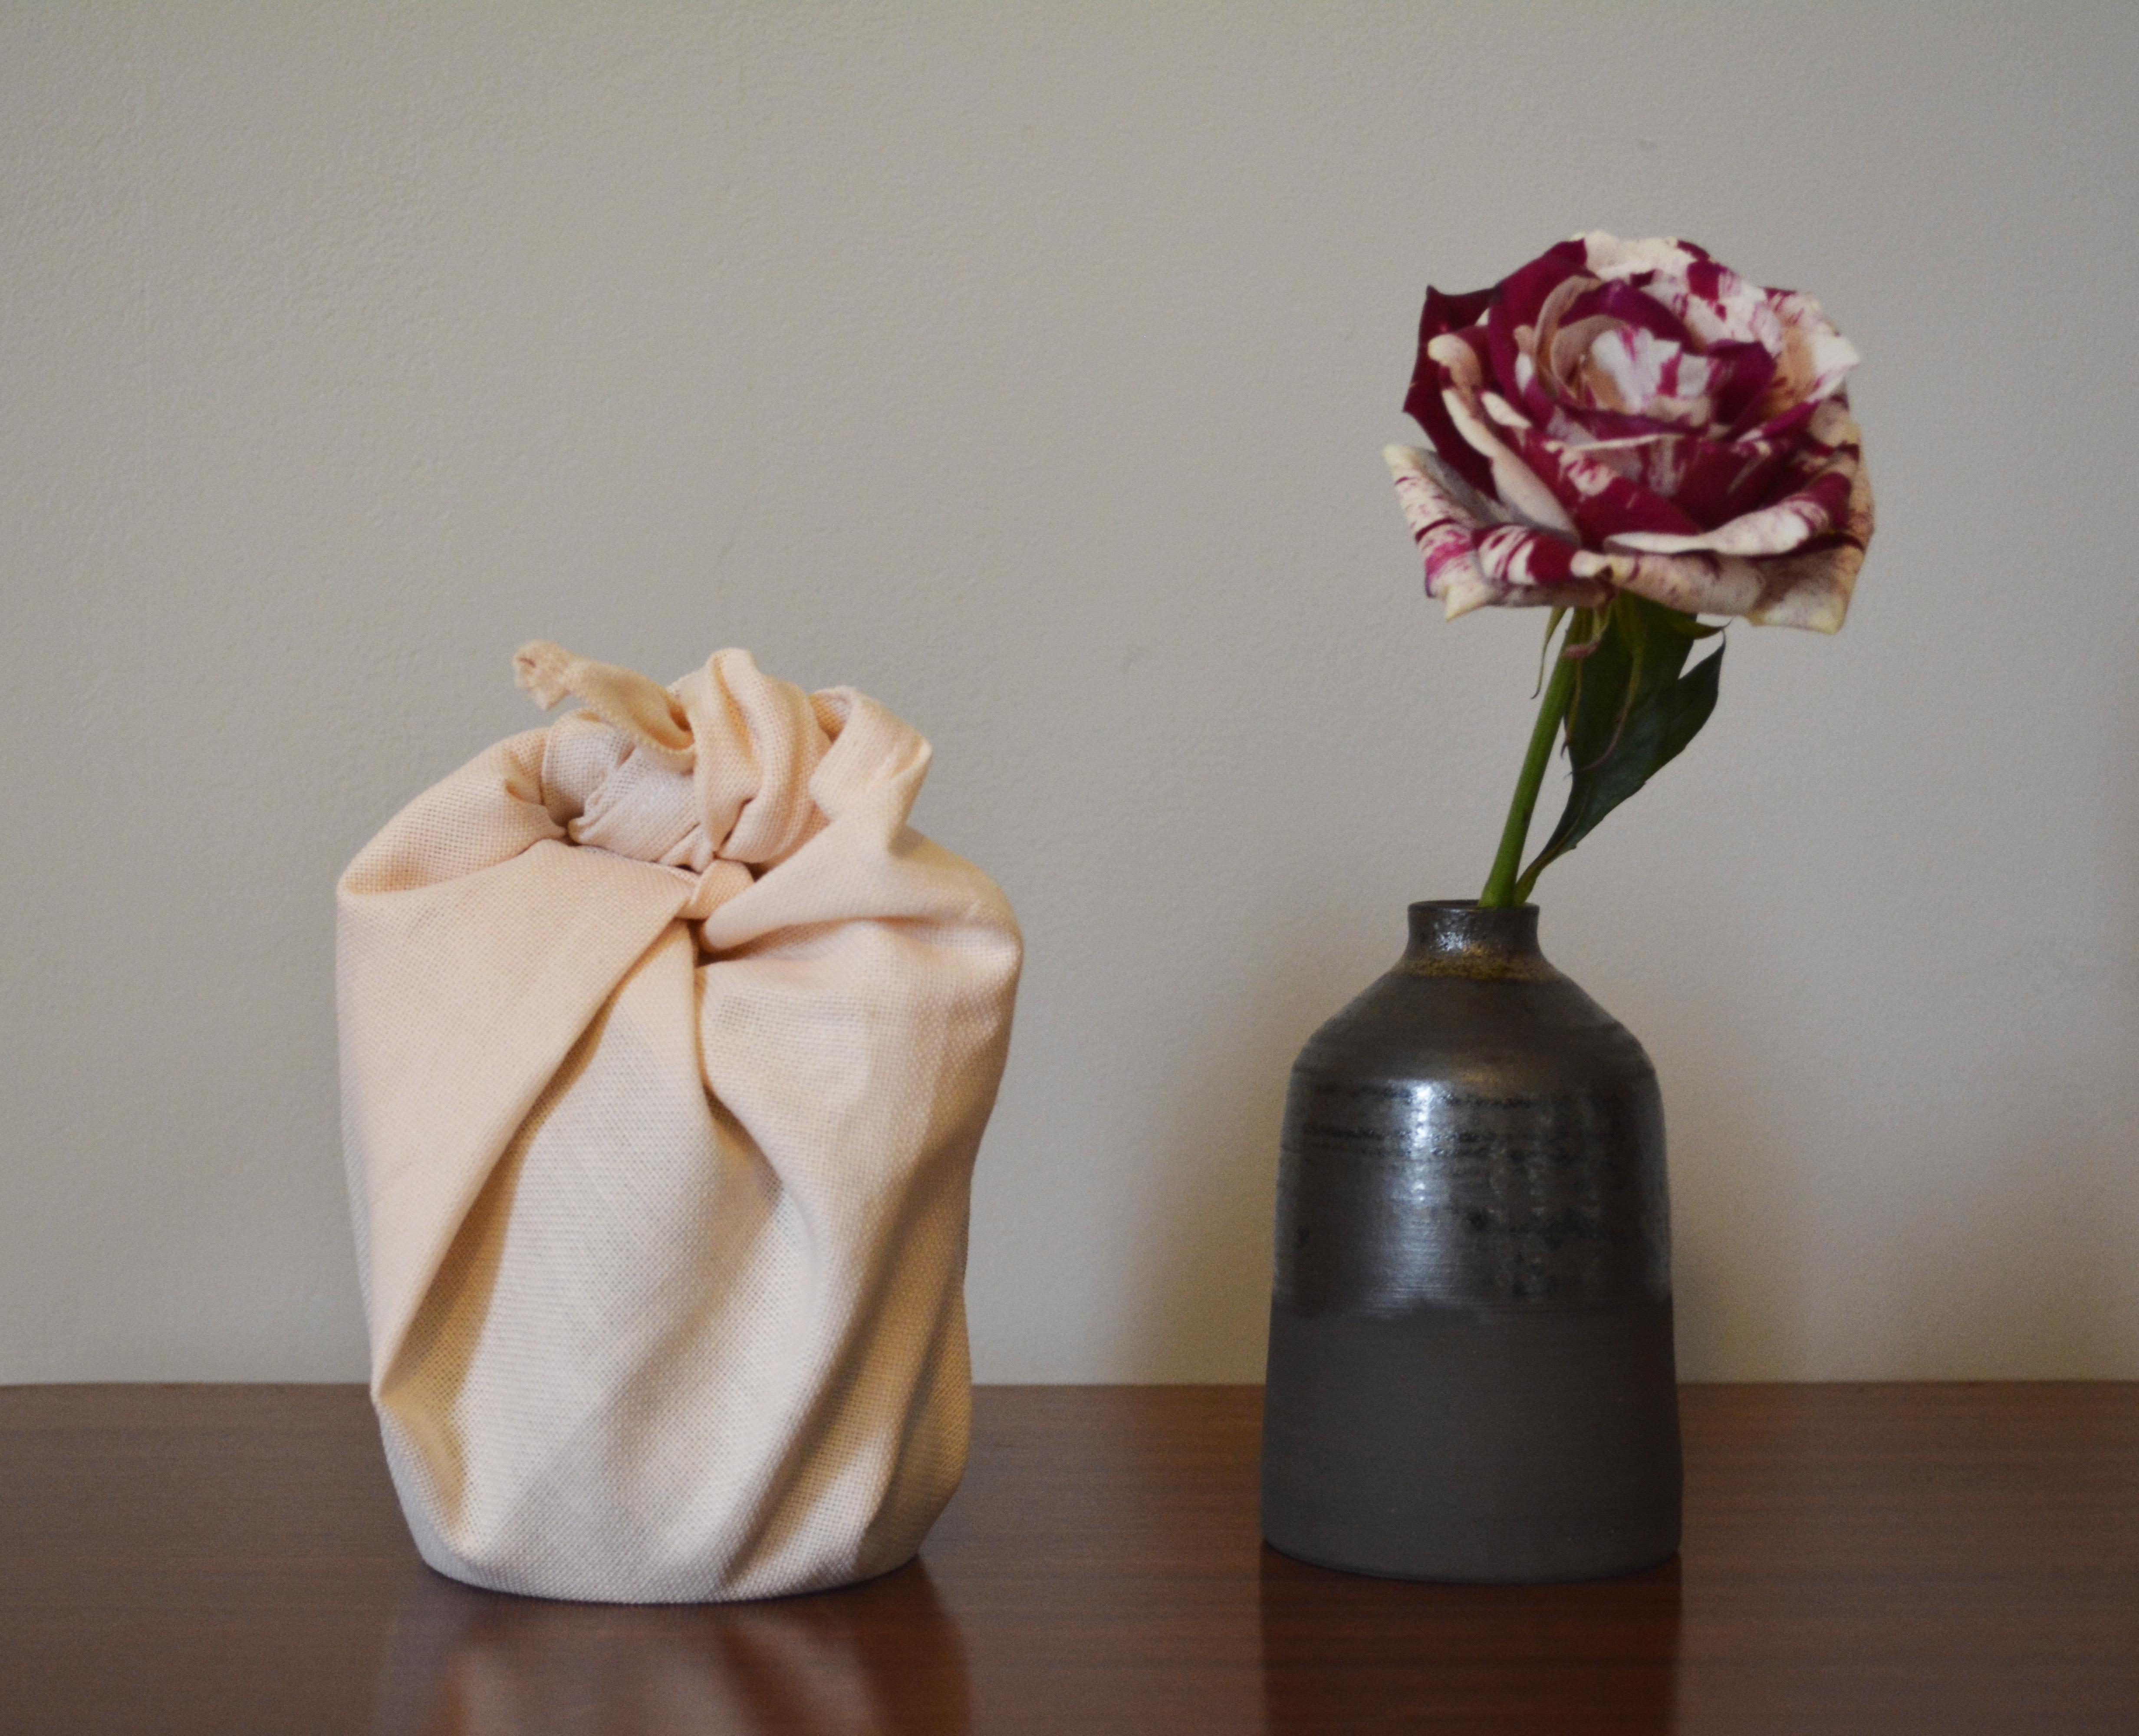 emballage et vase